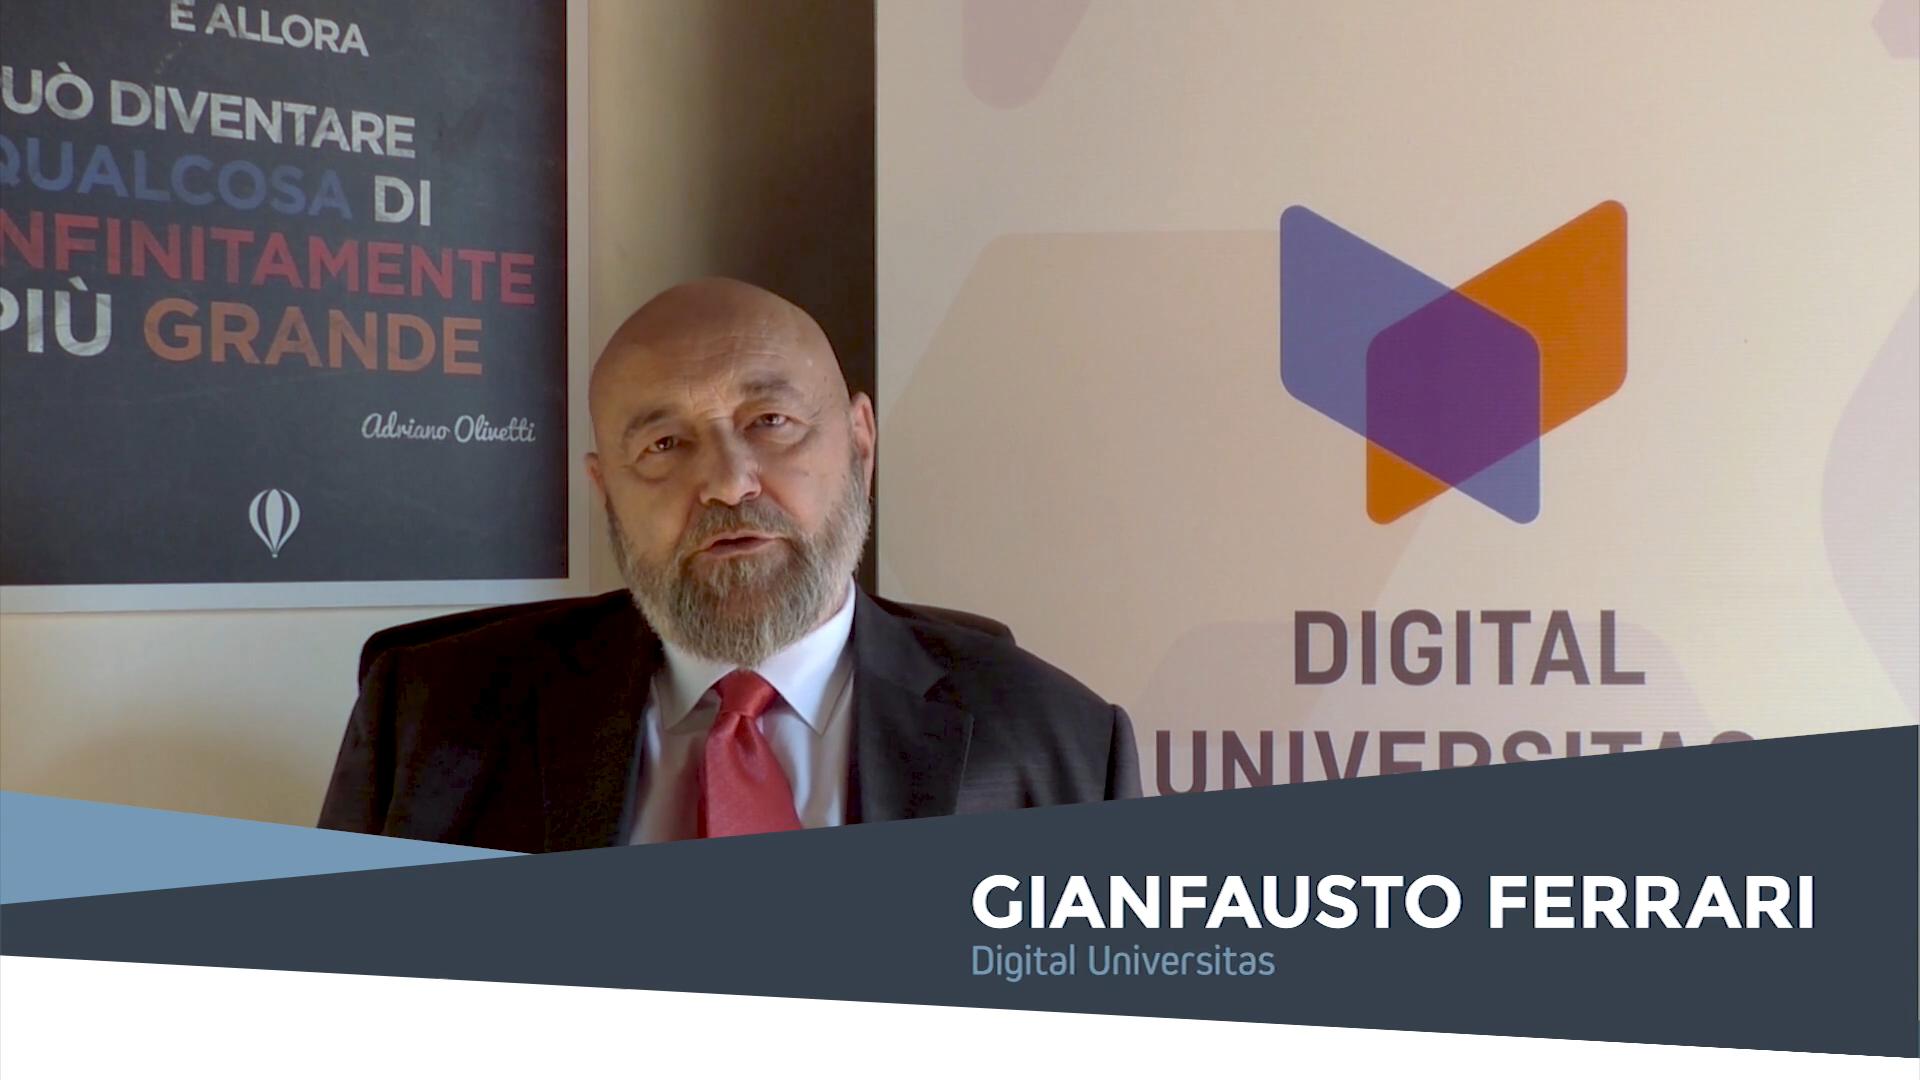 Intervista a Gianfausto Ferrari